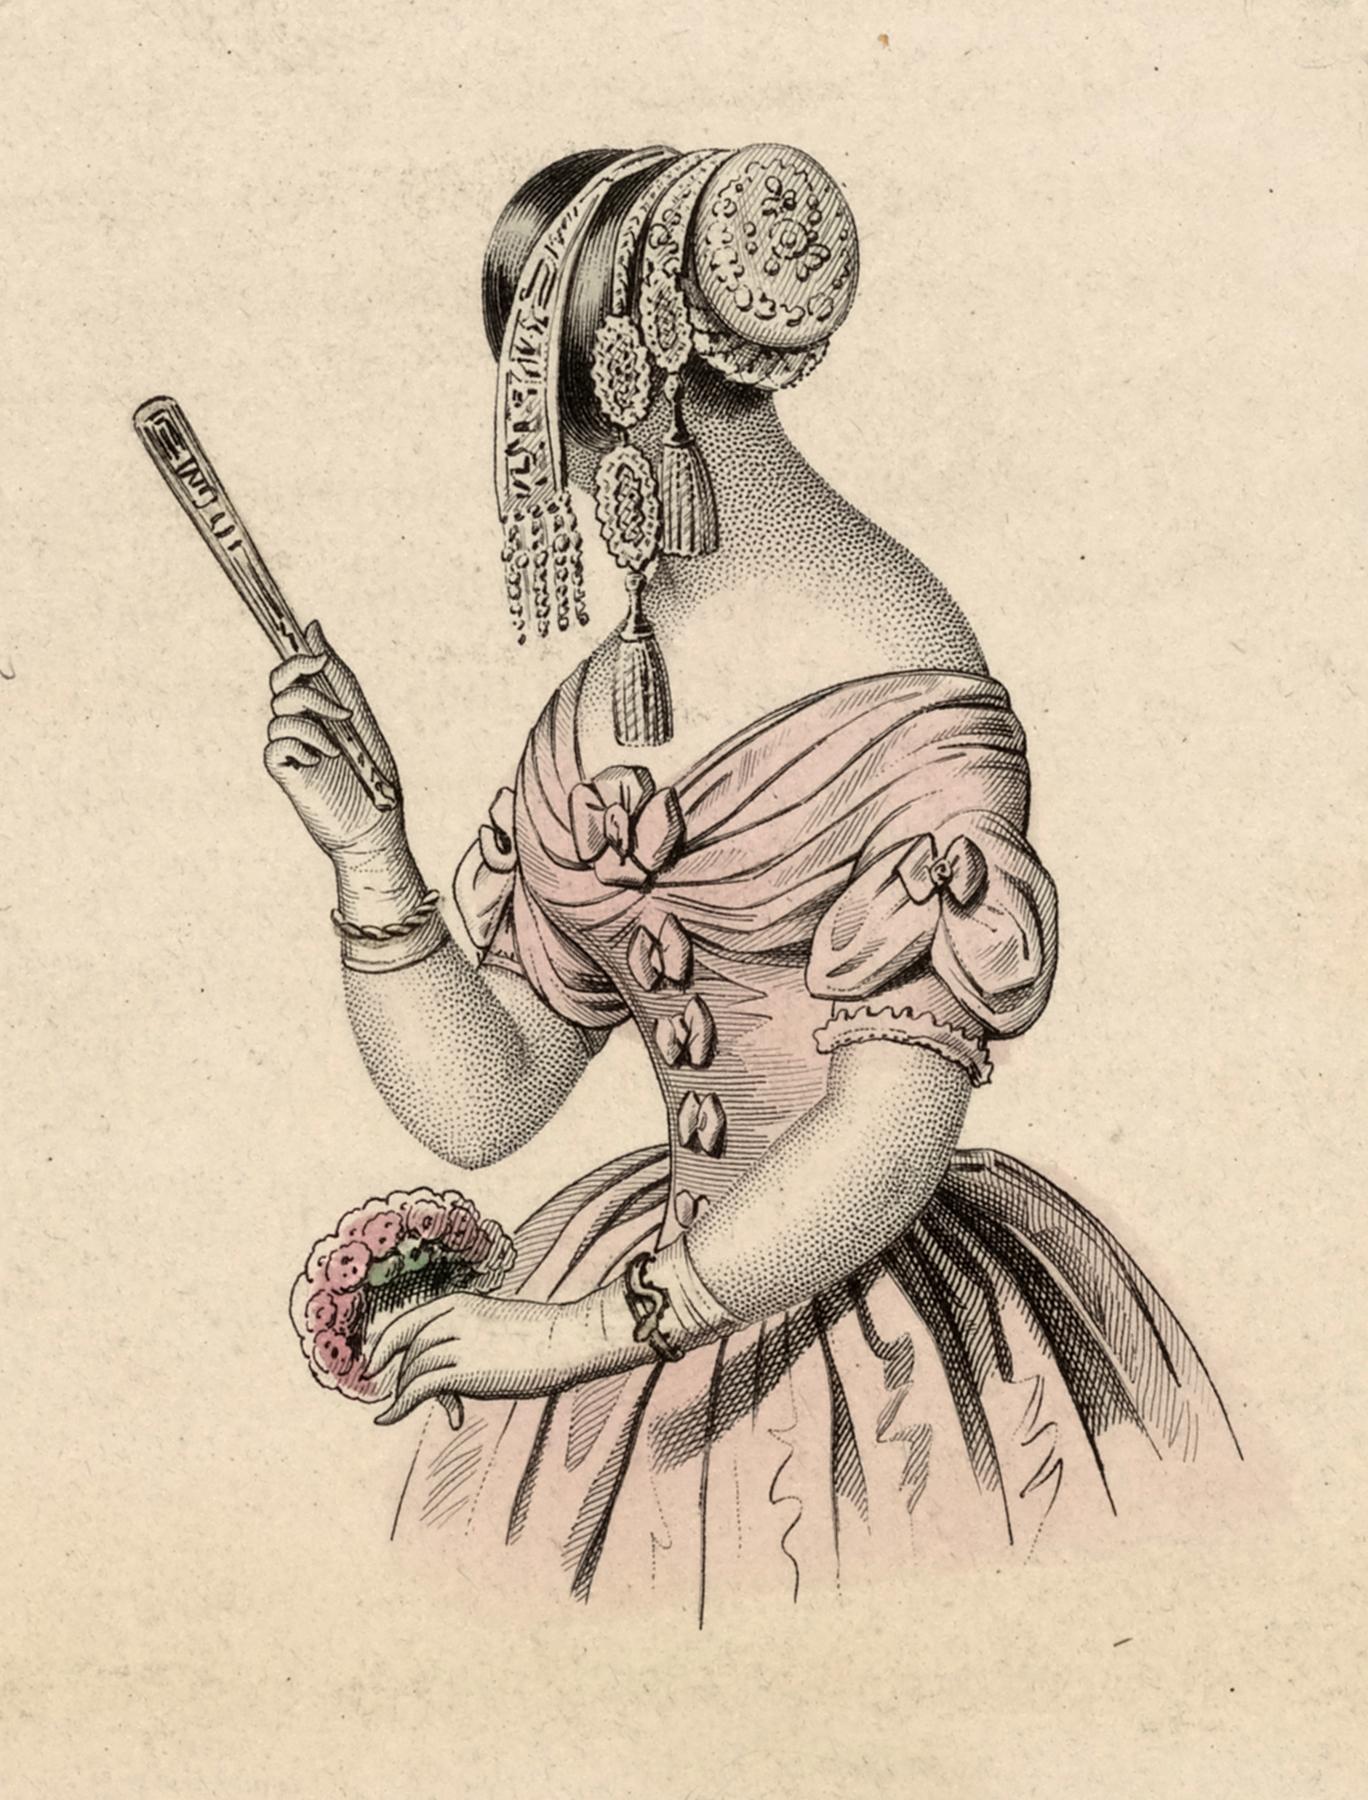 Vintage Lady Wearing A Pink Dress Image